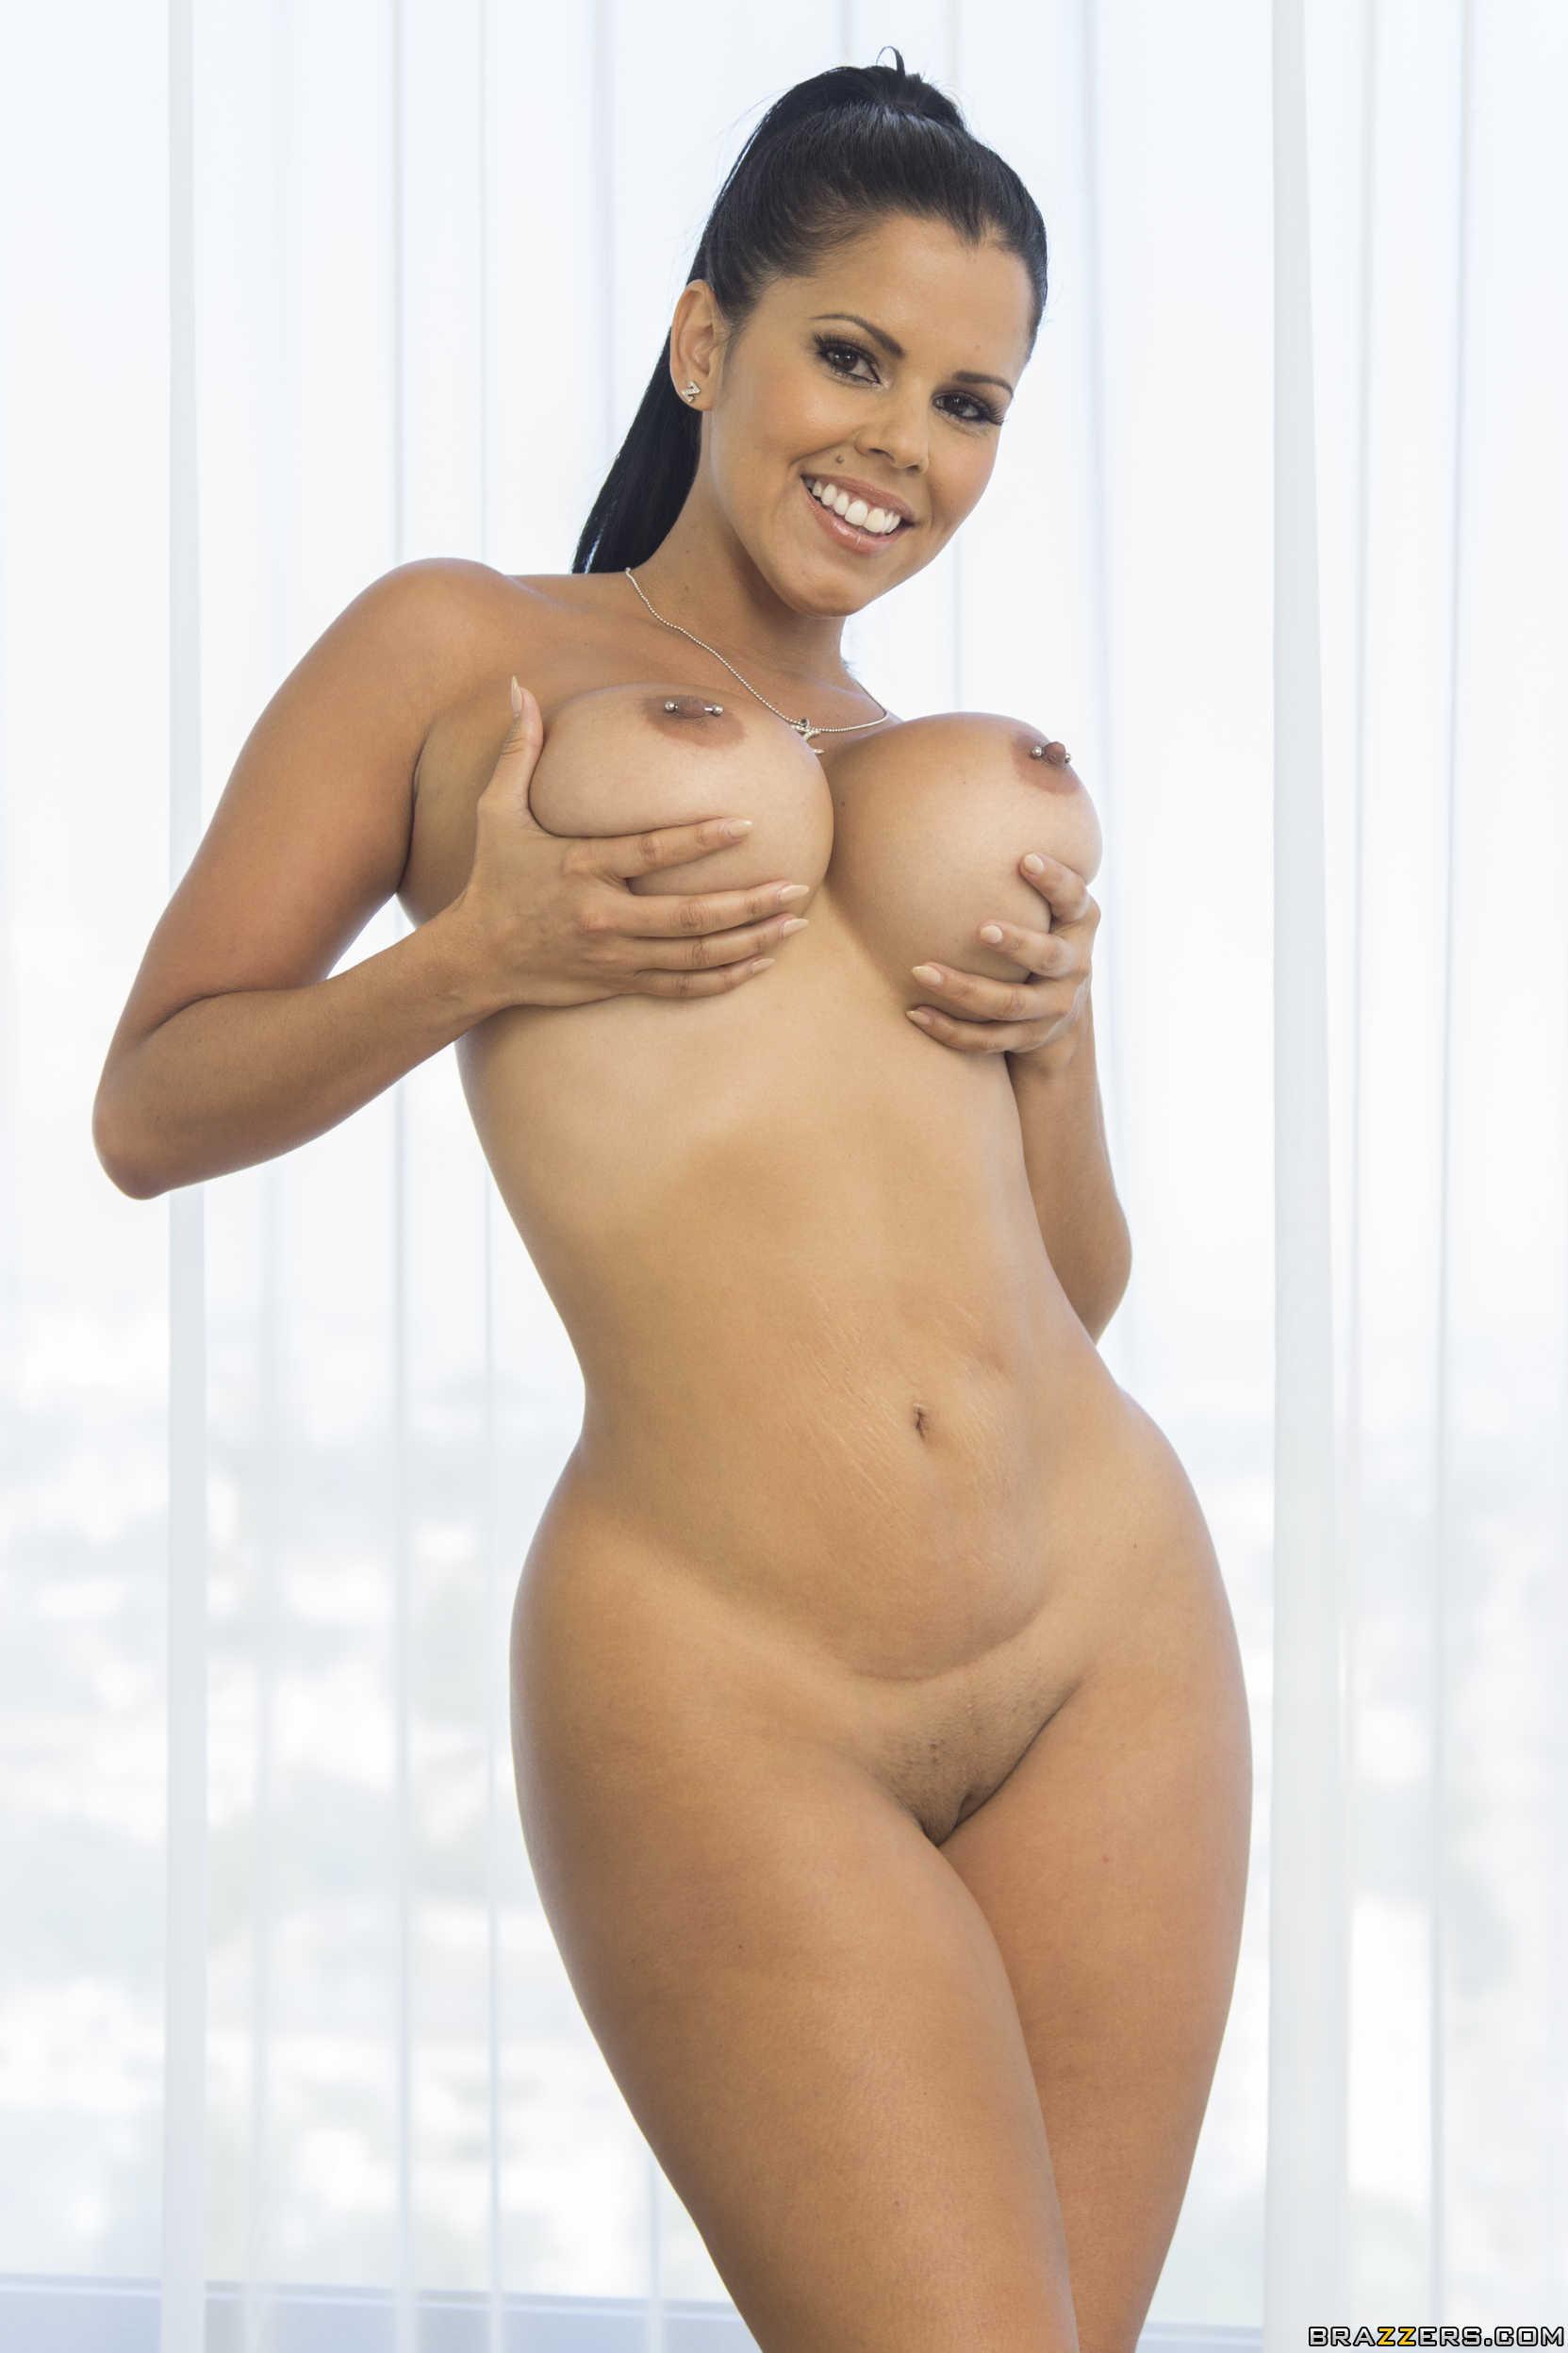 Monter curve pornstar pic porn clip